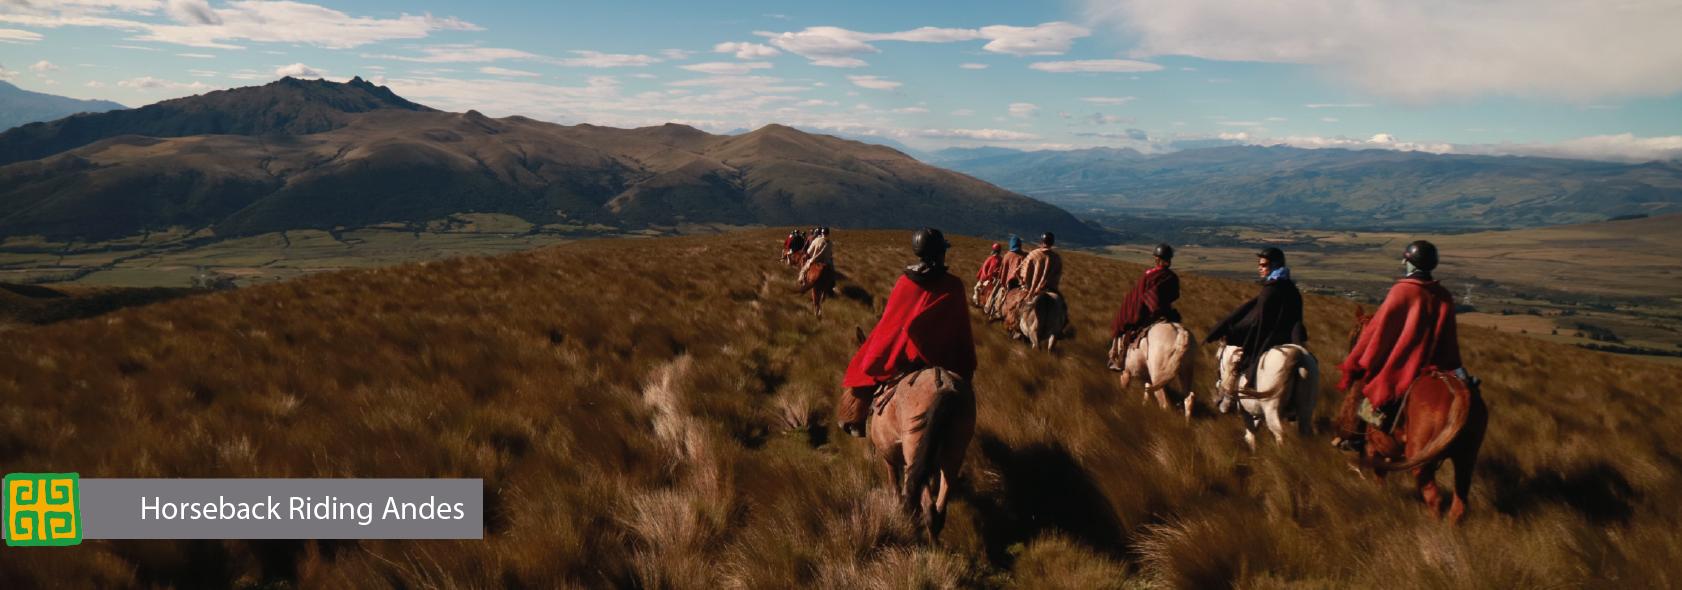 Horseback Riding Andes